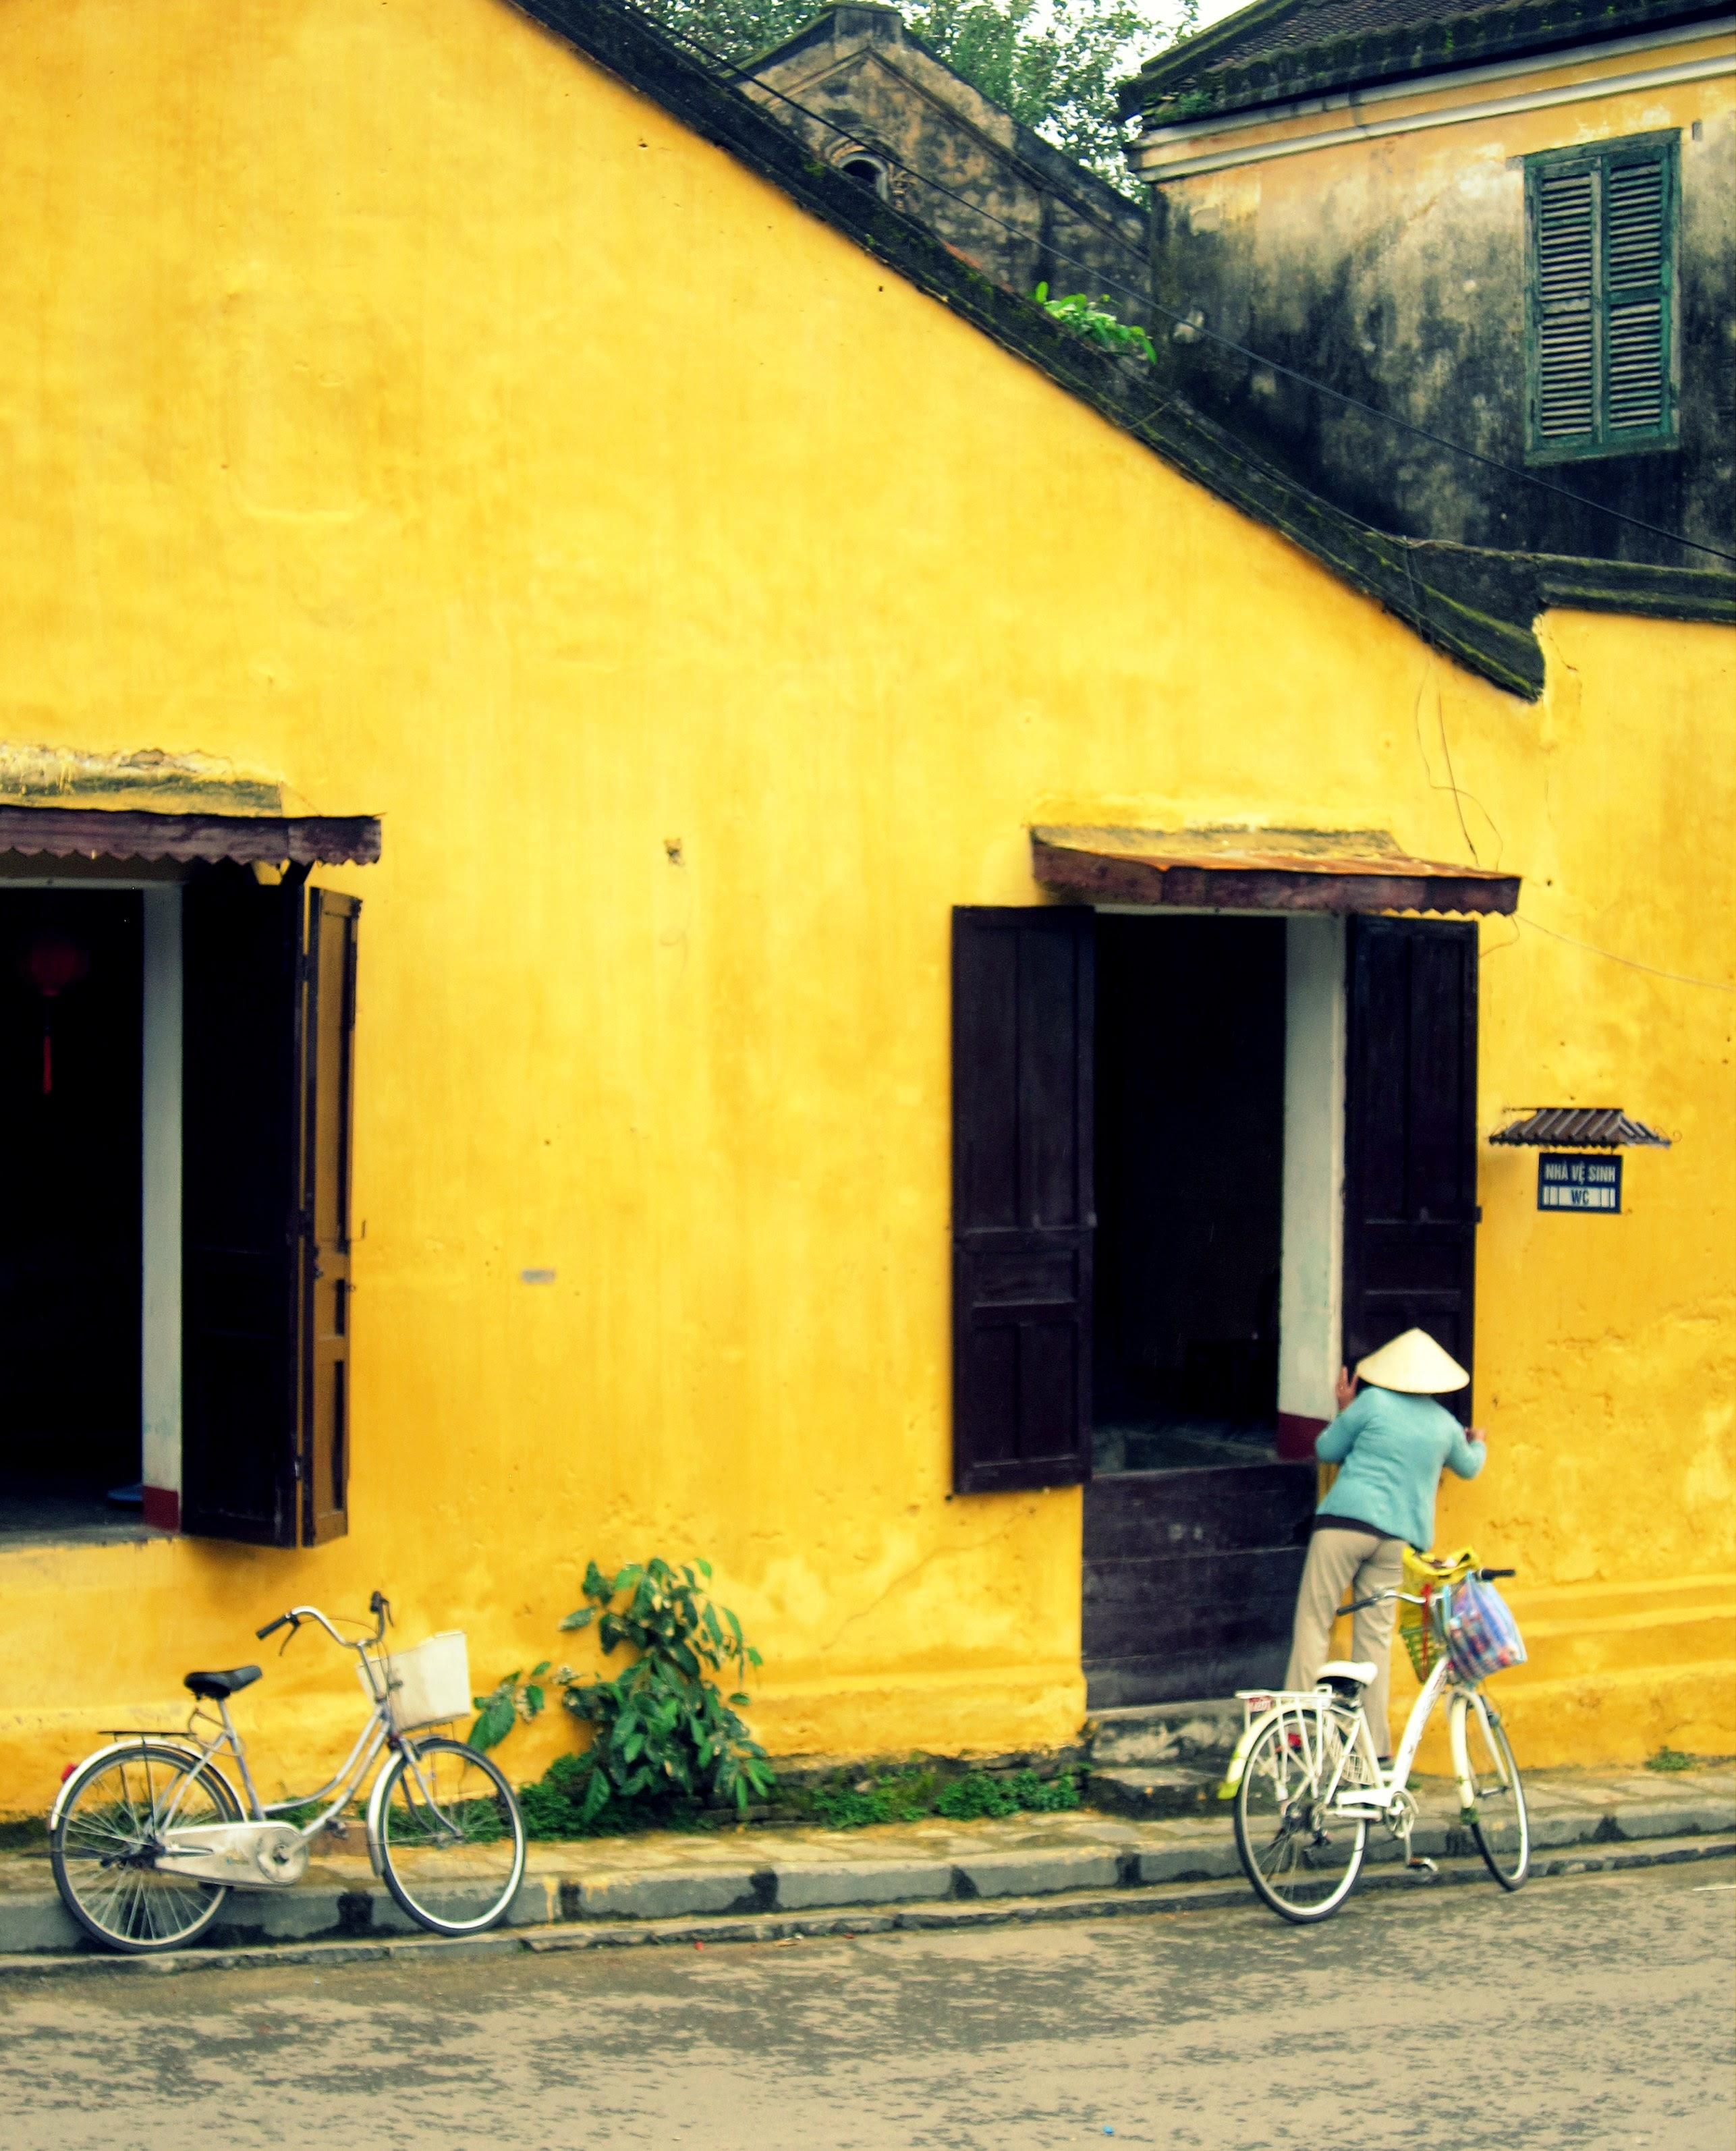 A yellow house in Hoi An, Vietnam